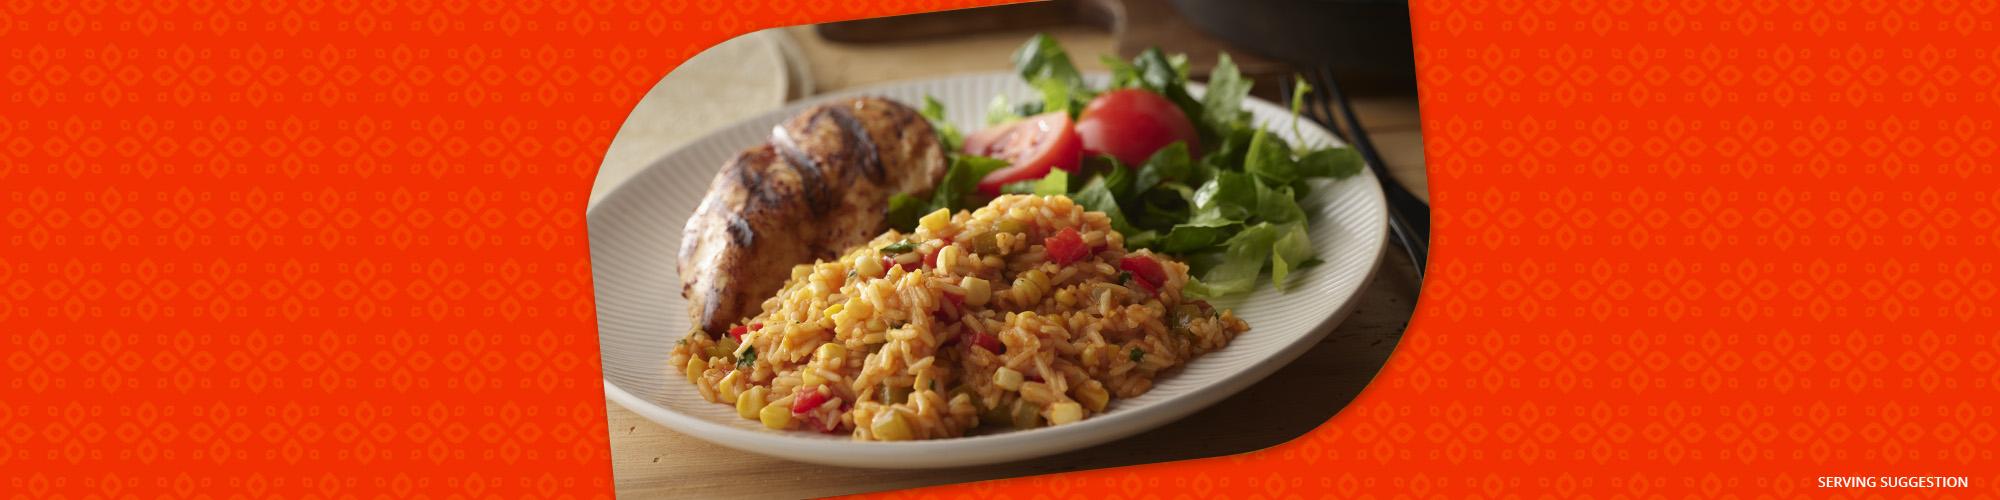 Salsas enchilada rice